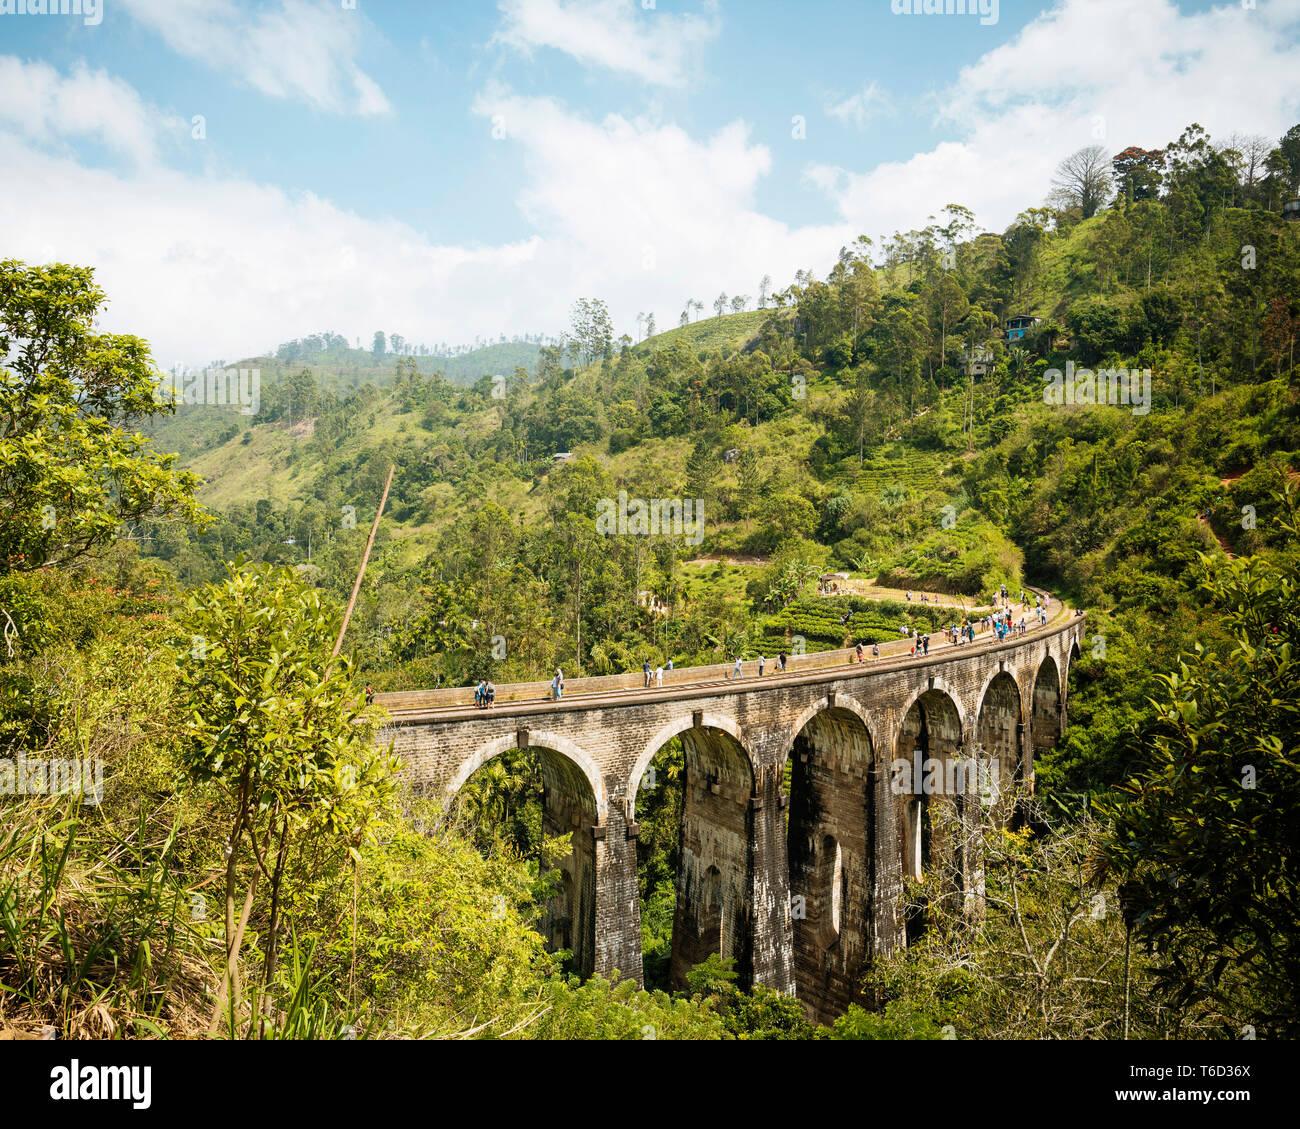 Neun Bogenbrücke, Ella, Provinz Uva, Sri Lanka, Asien Stockfoto